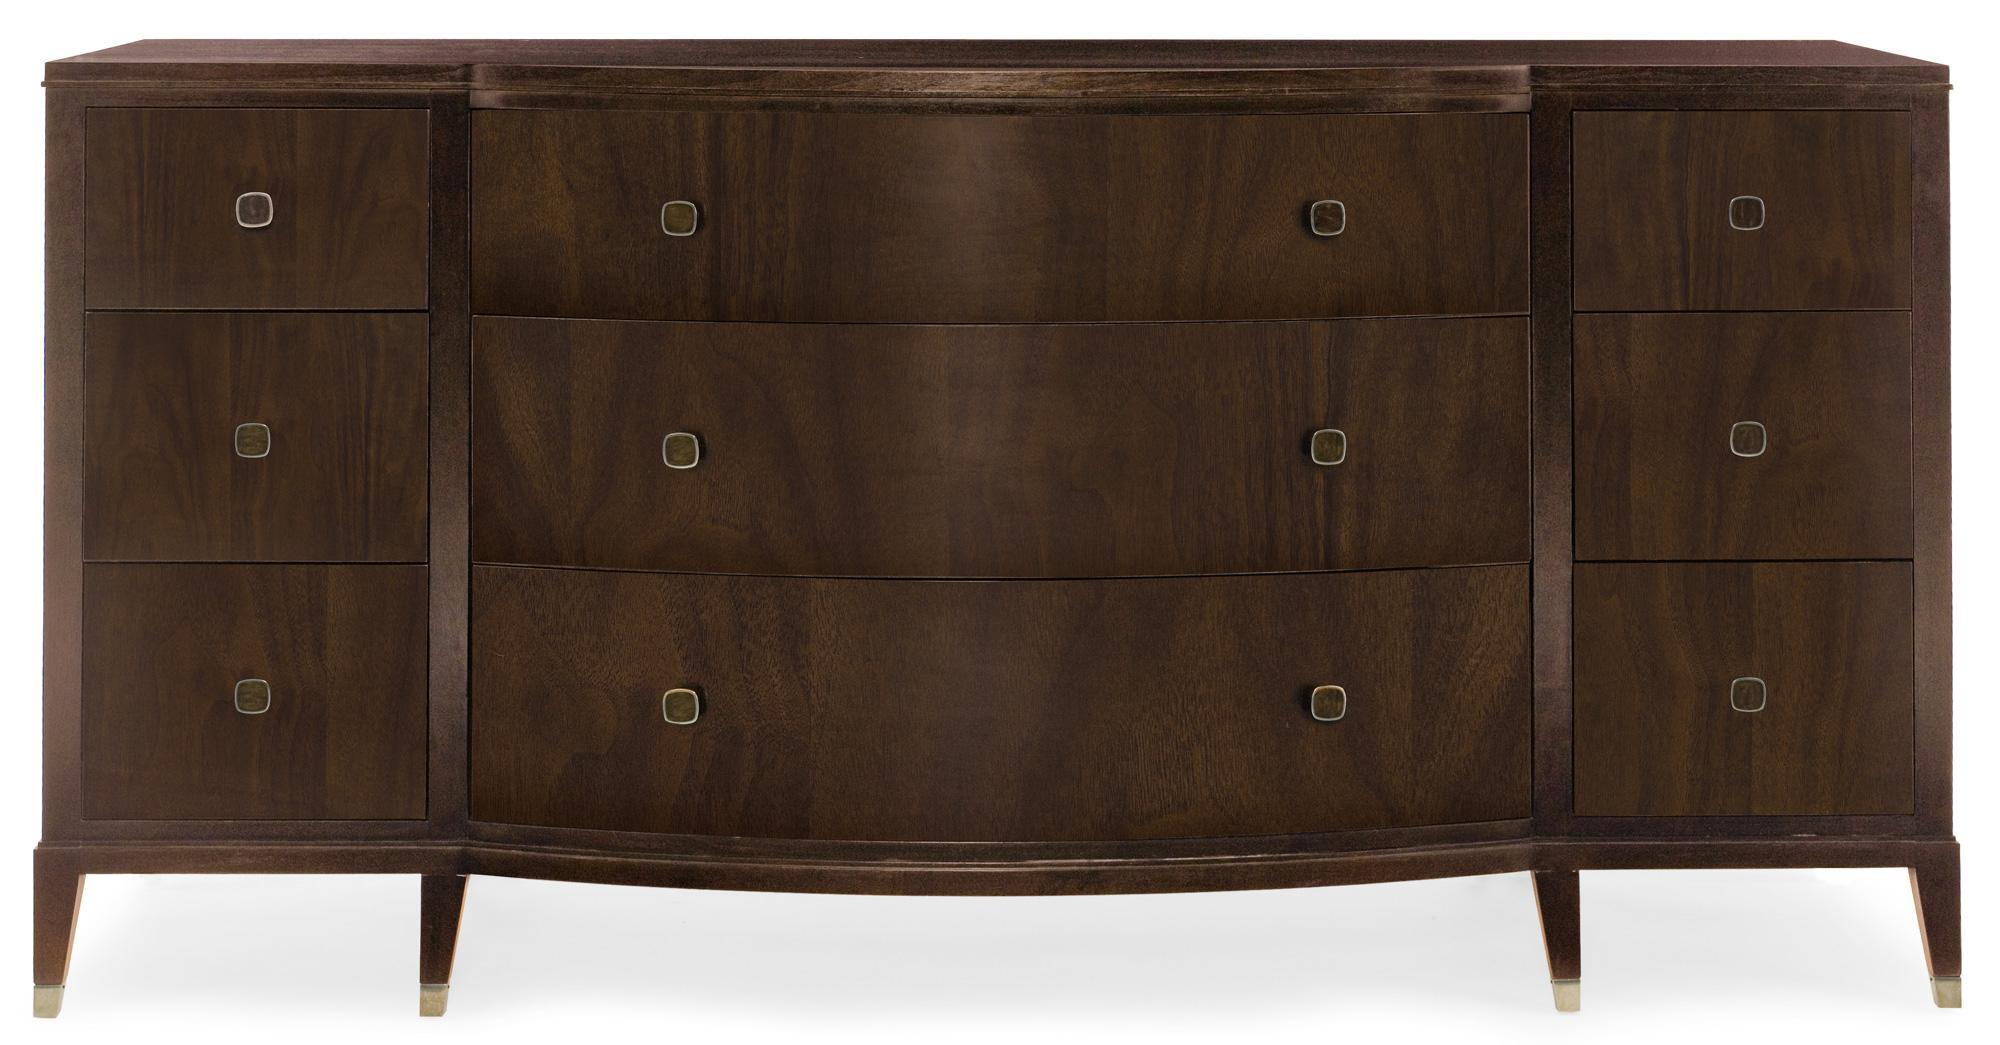 Bernhardt Haven 9 Drawer Dresser With Curved Front Reeds